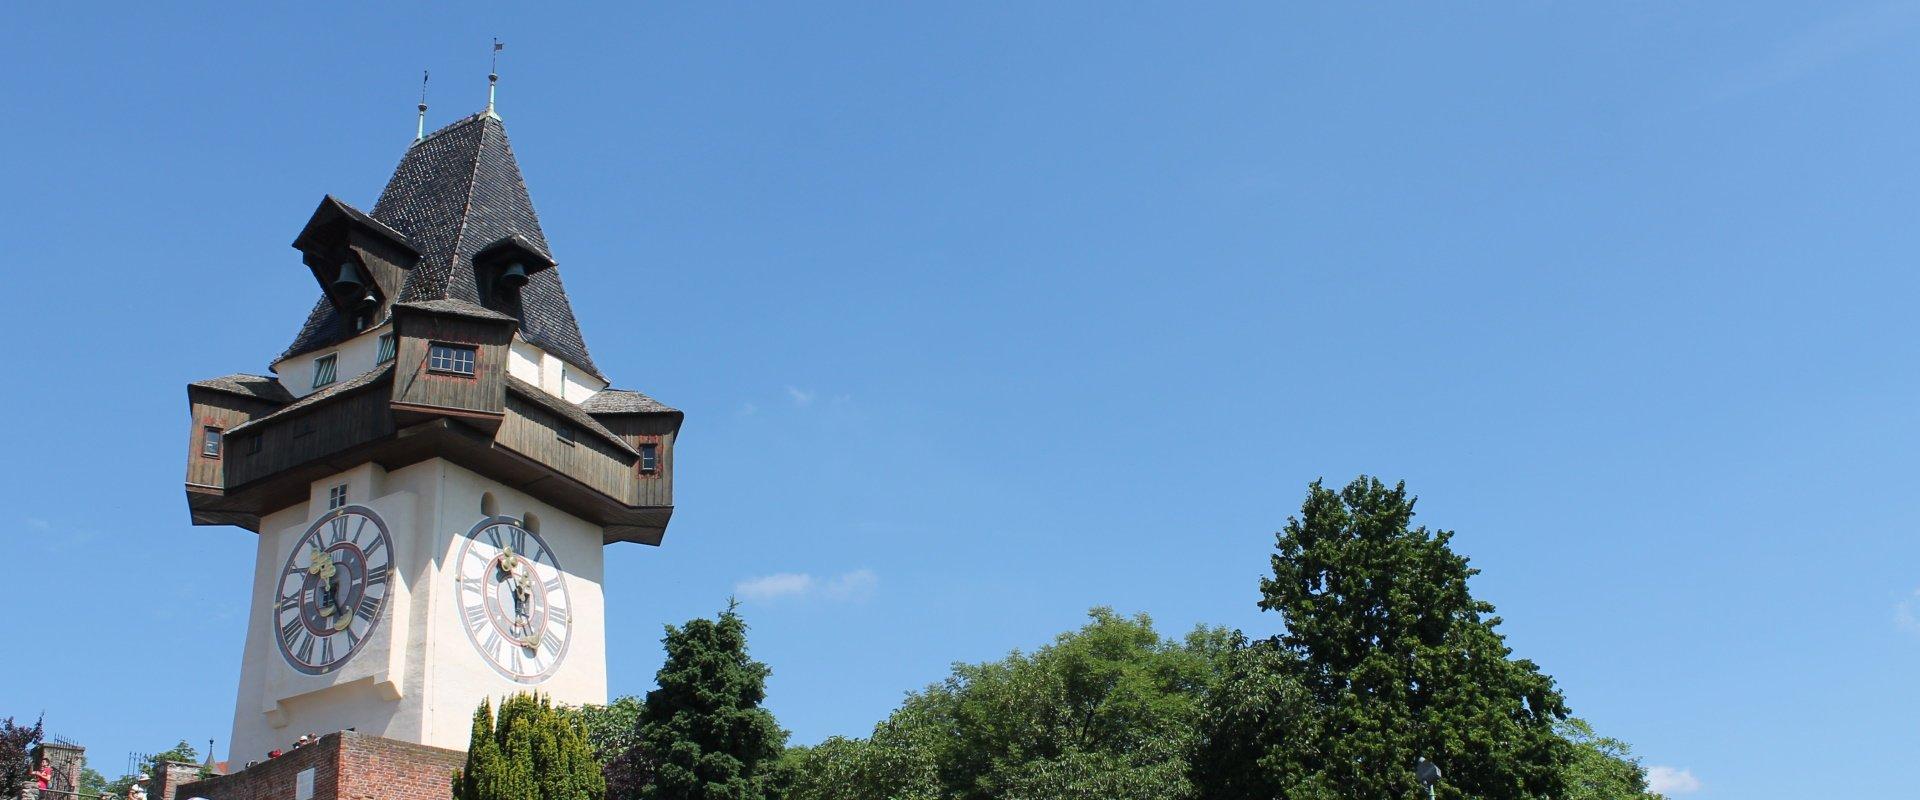 graz-uhrturm-steiermark-oostenrijk.jpg